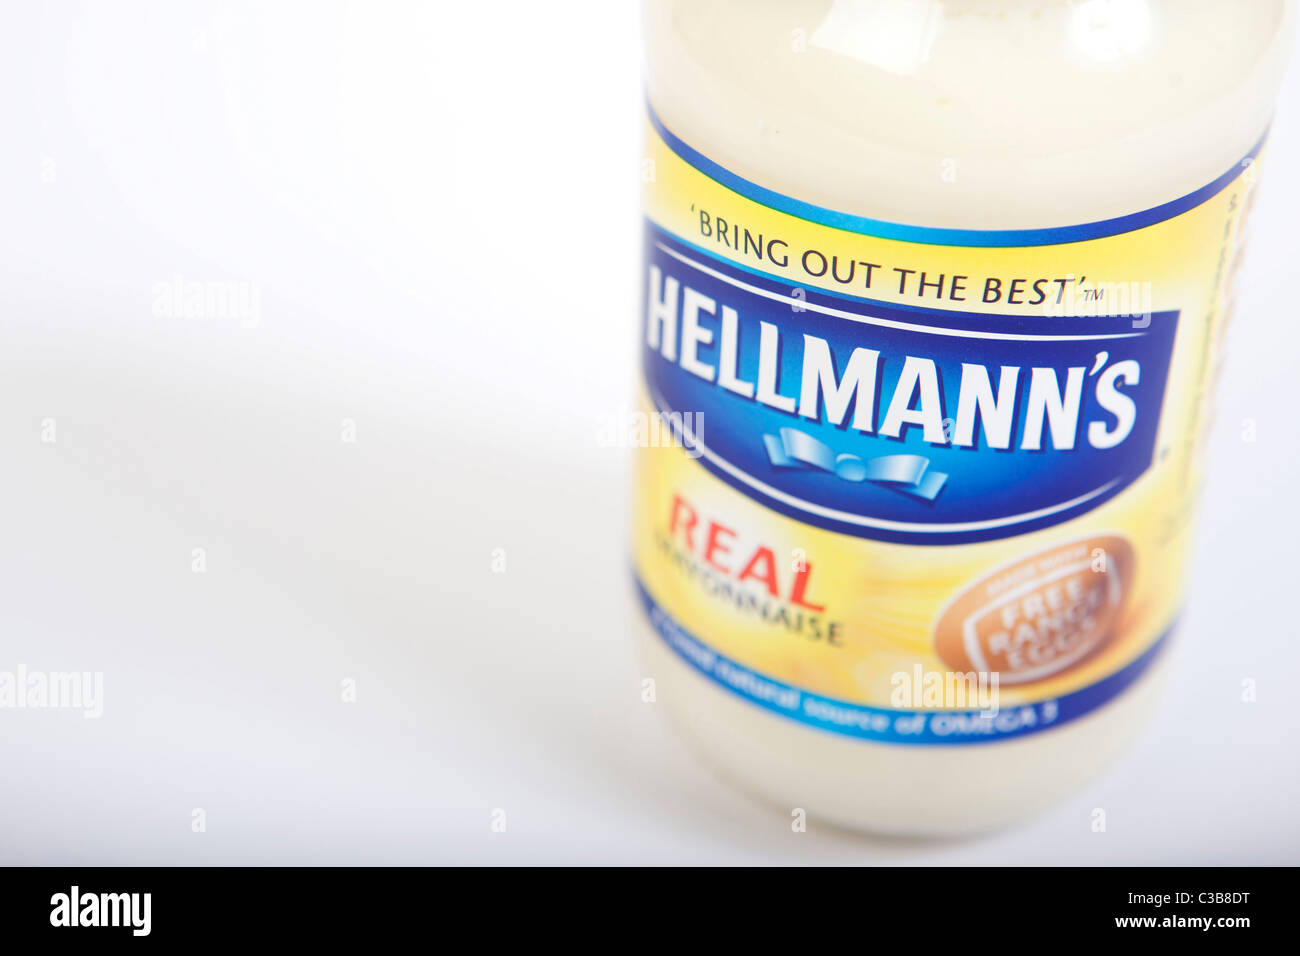 Illustrative image of Hellman's Mayonnaise. - Stock Image